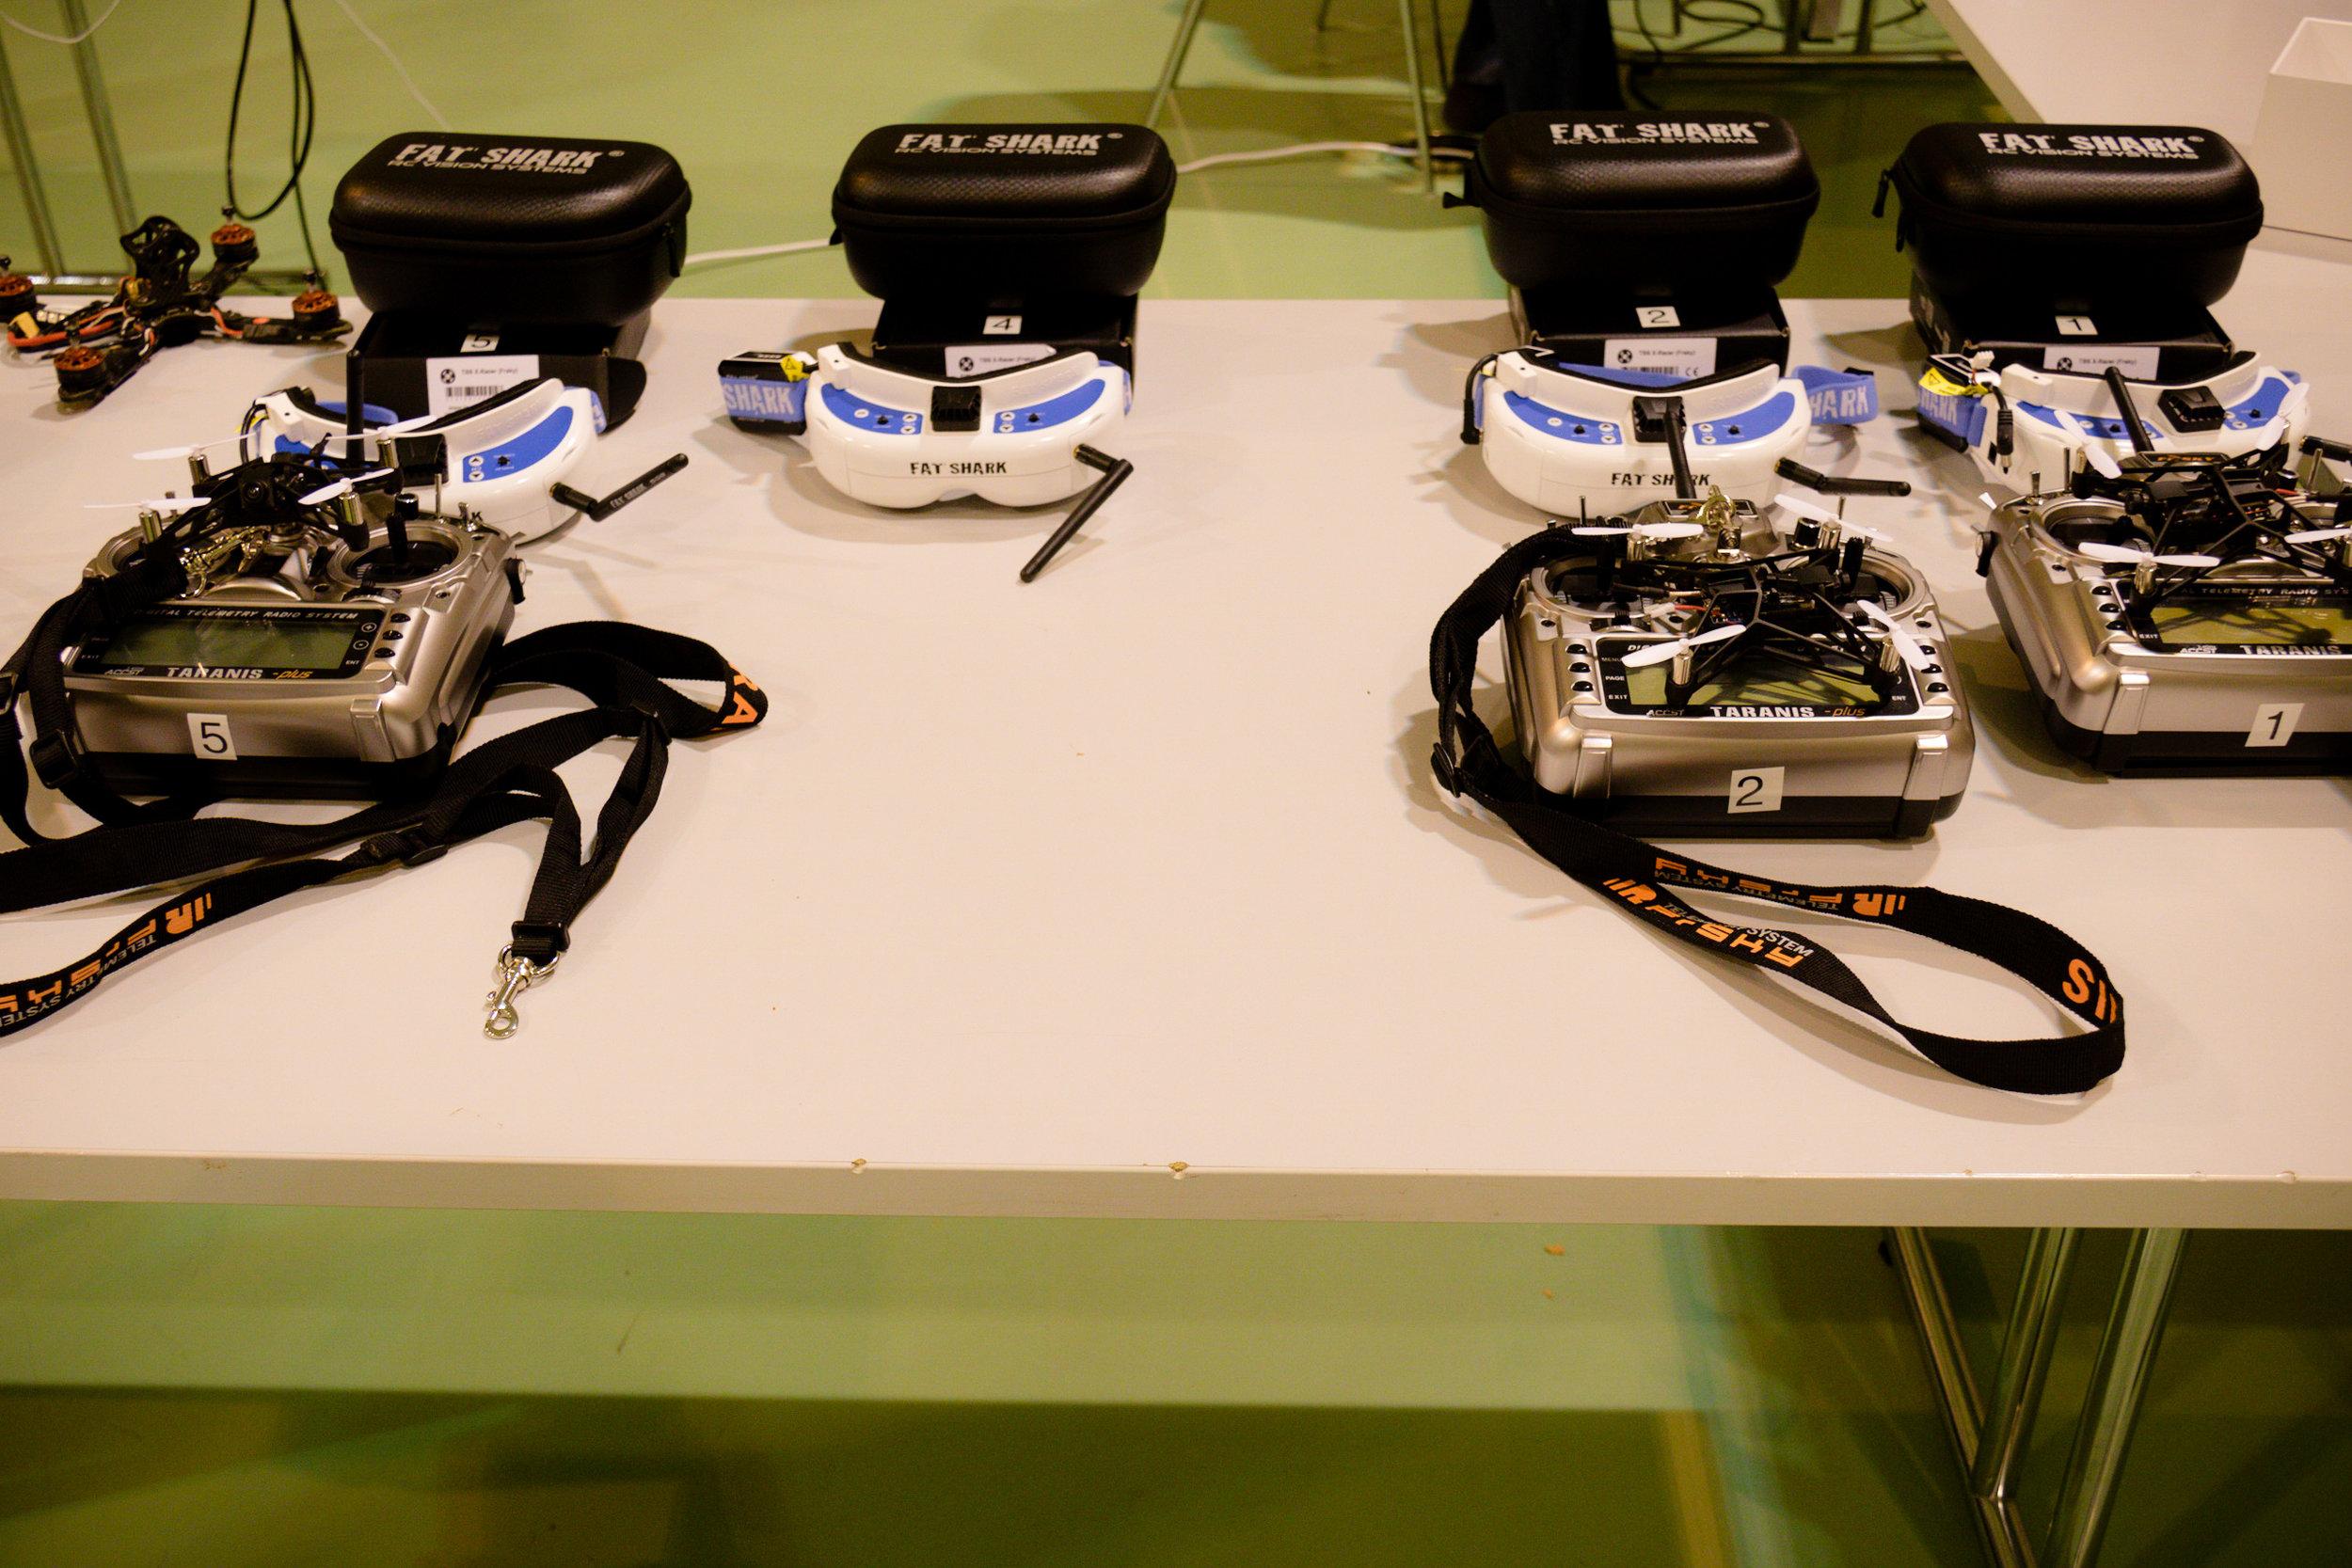 20170112-transmitter sets.jpg